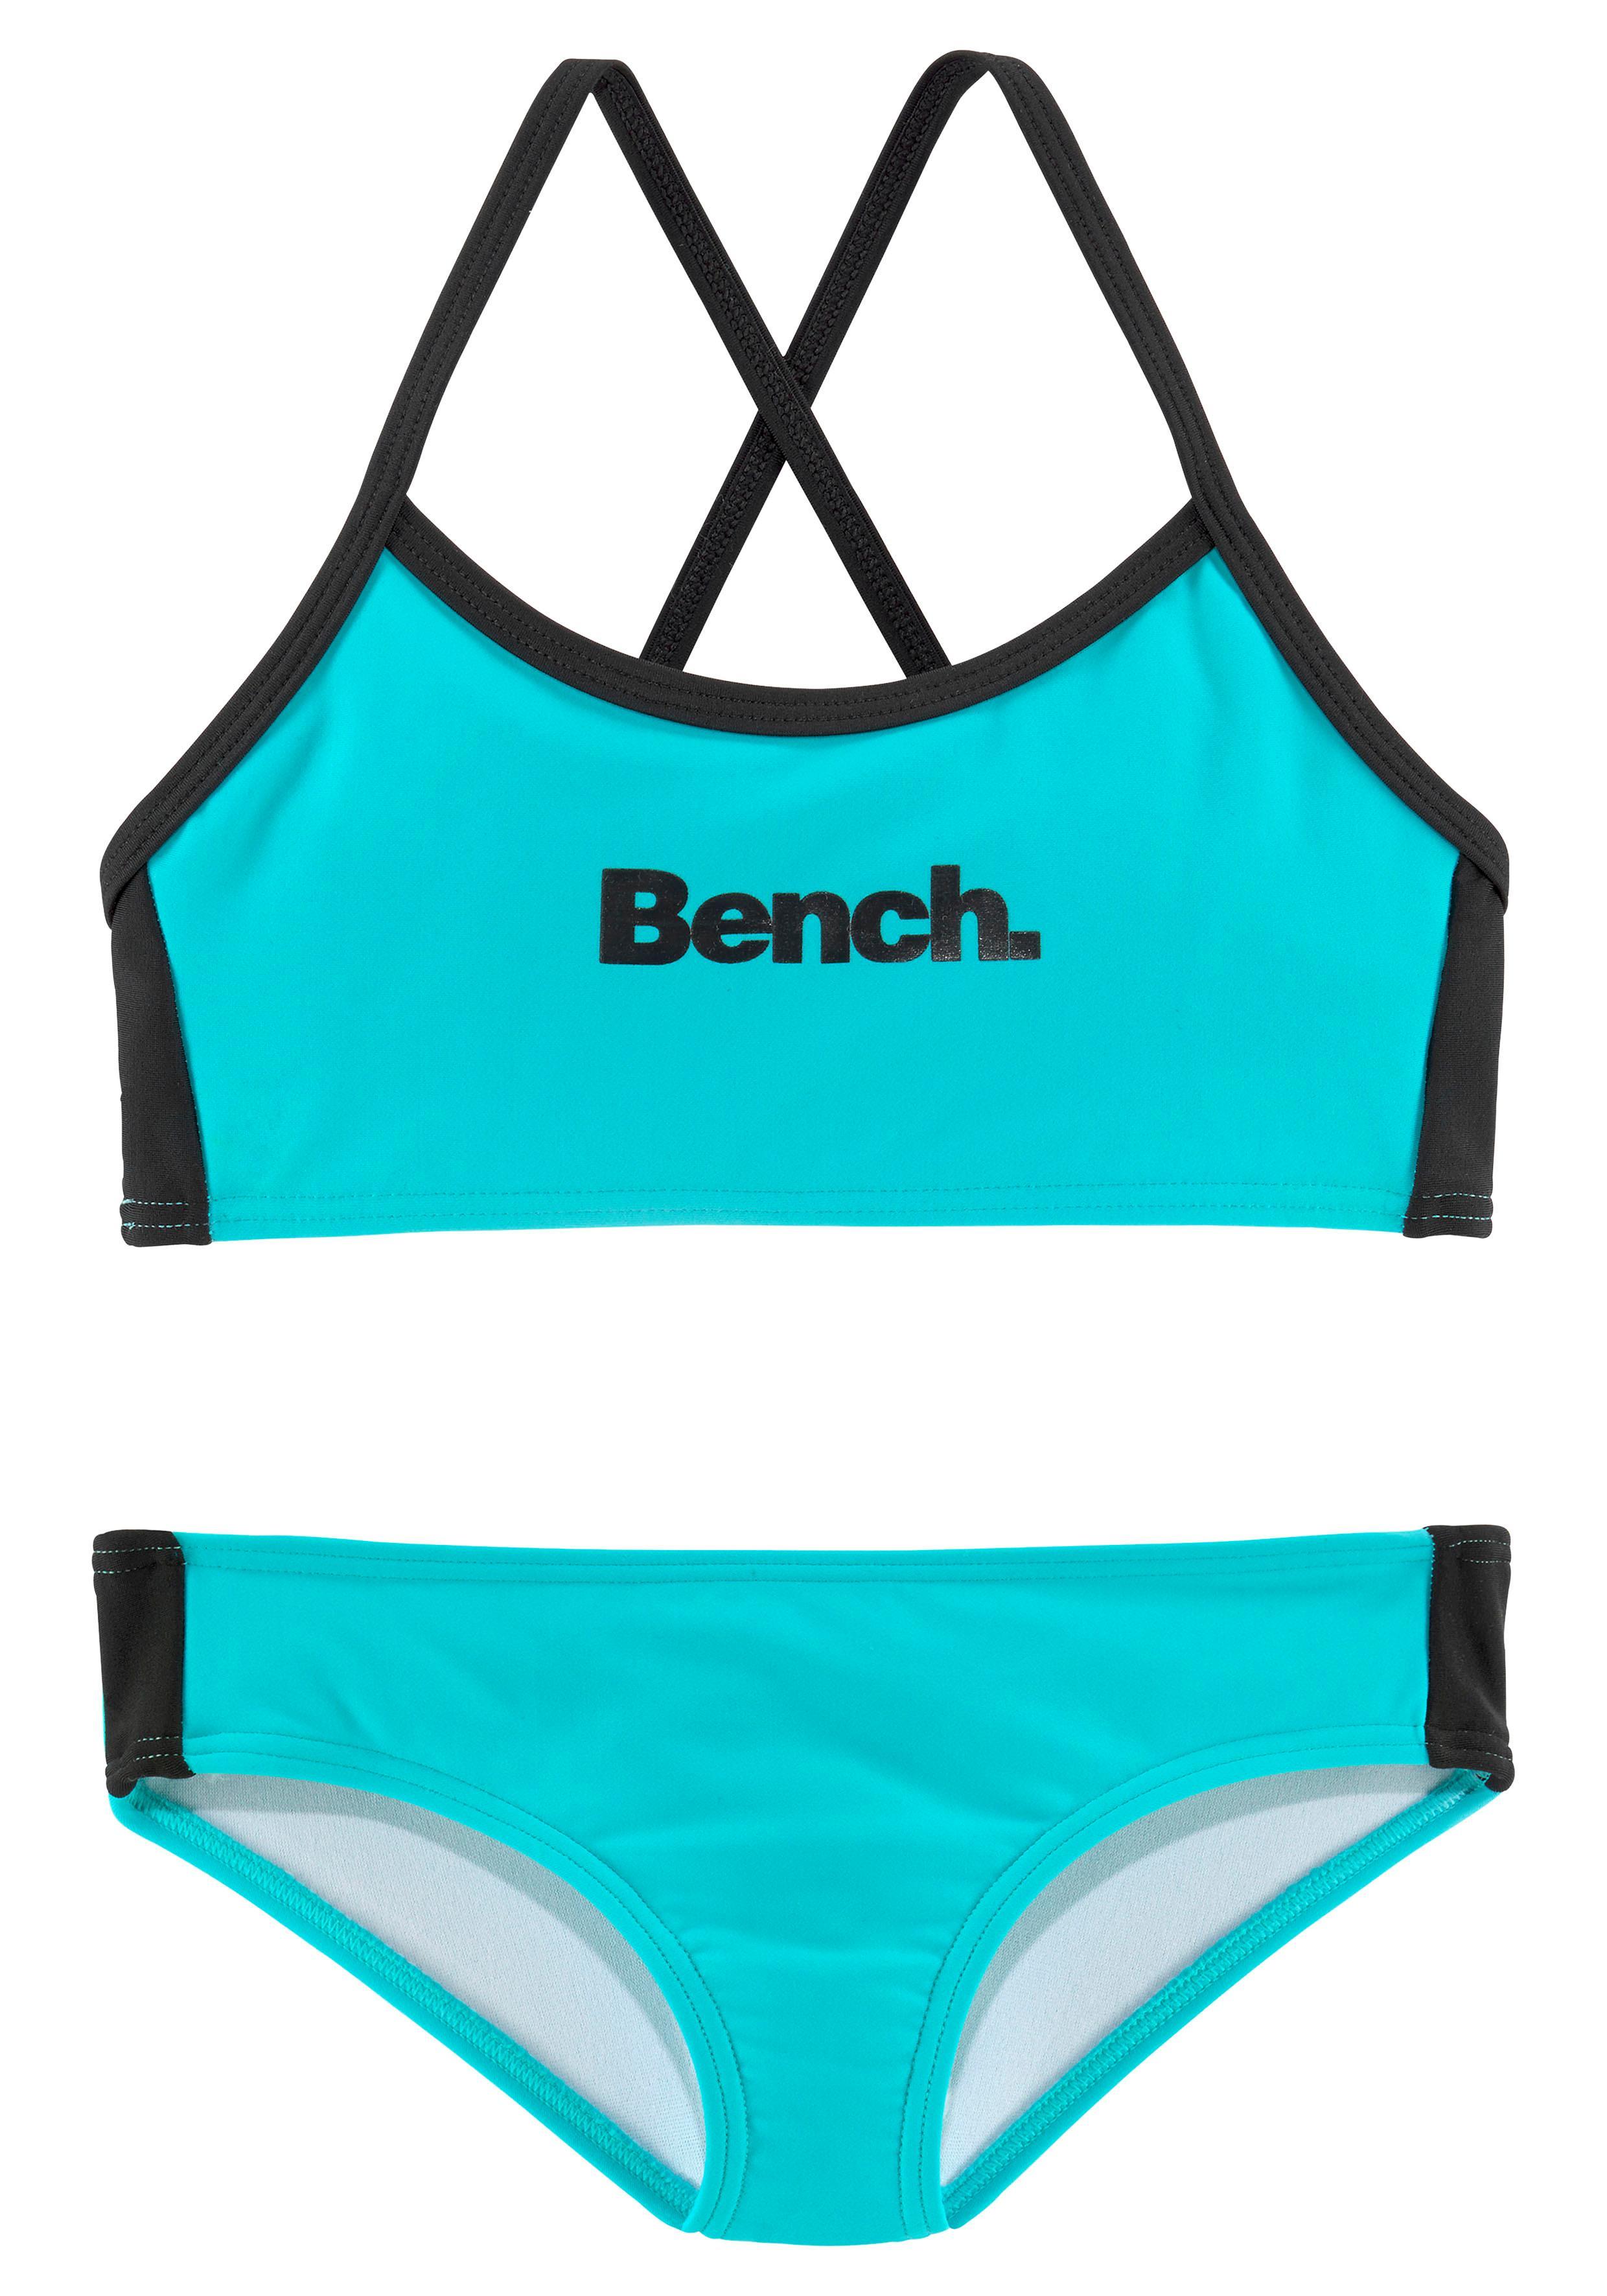 Bench. Bustier-Bikini